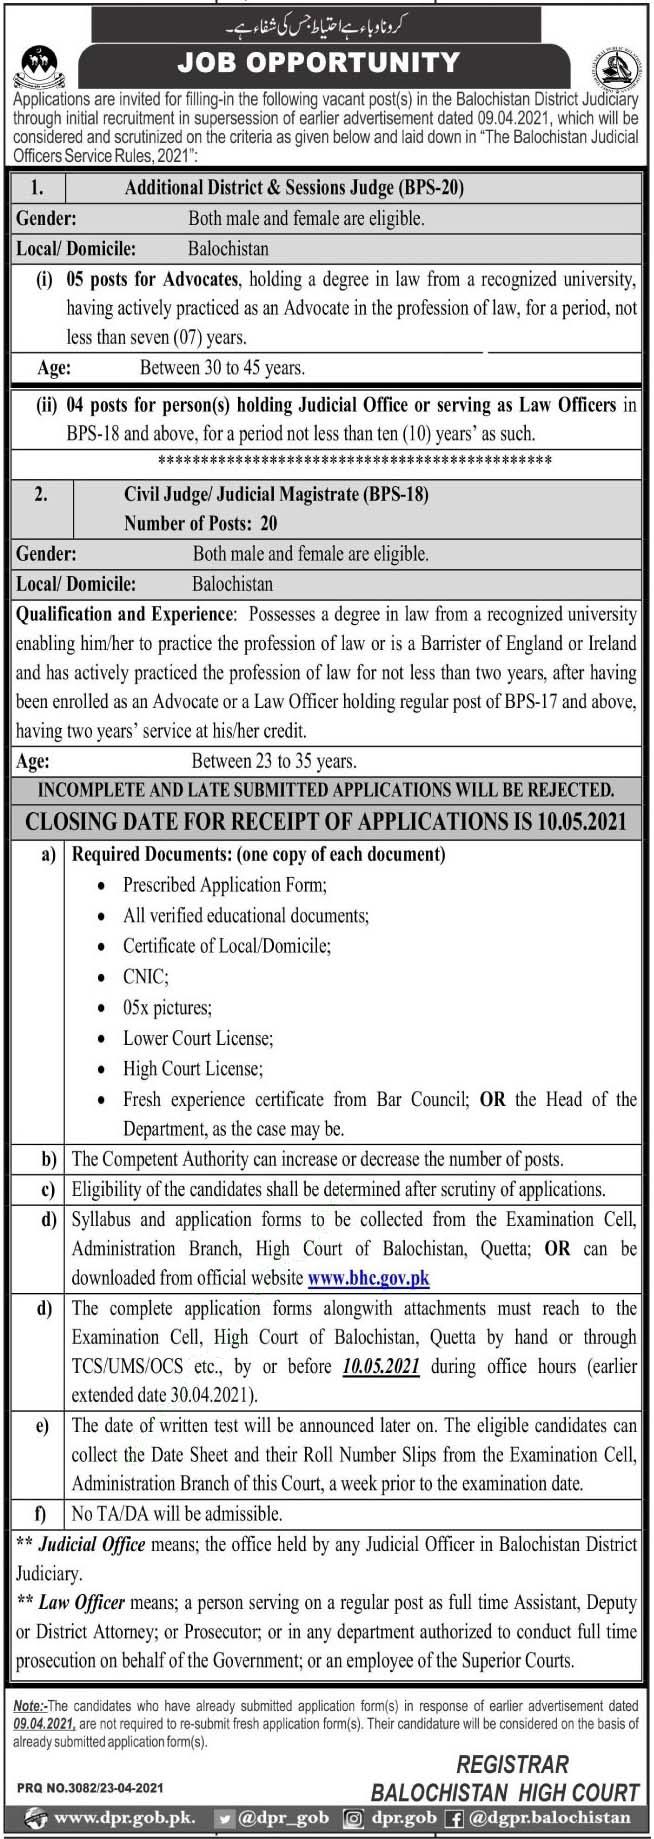 New Highcourt Jobs in Quetta Balochistan Jobs 2021 For District & Session Judge, Judicial Advocates by www.newjobs.pk